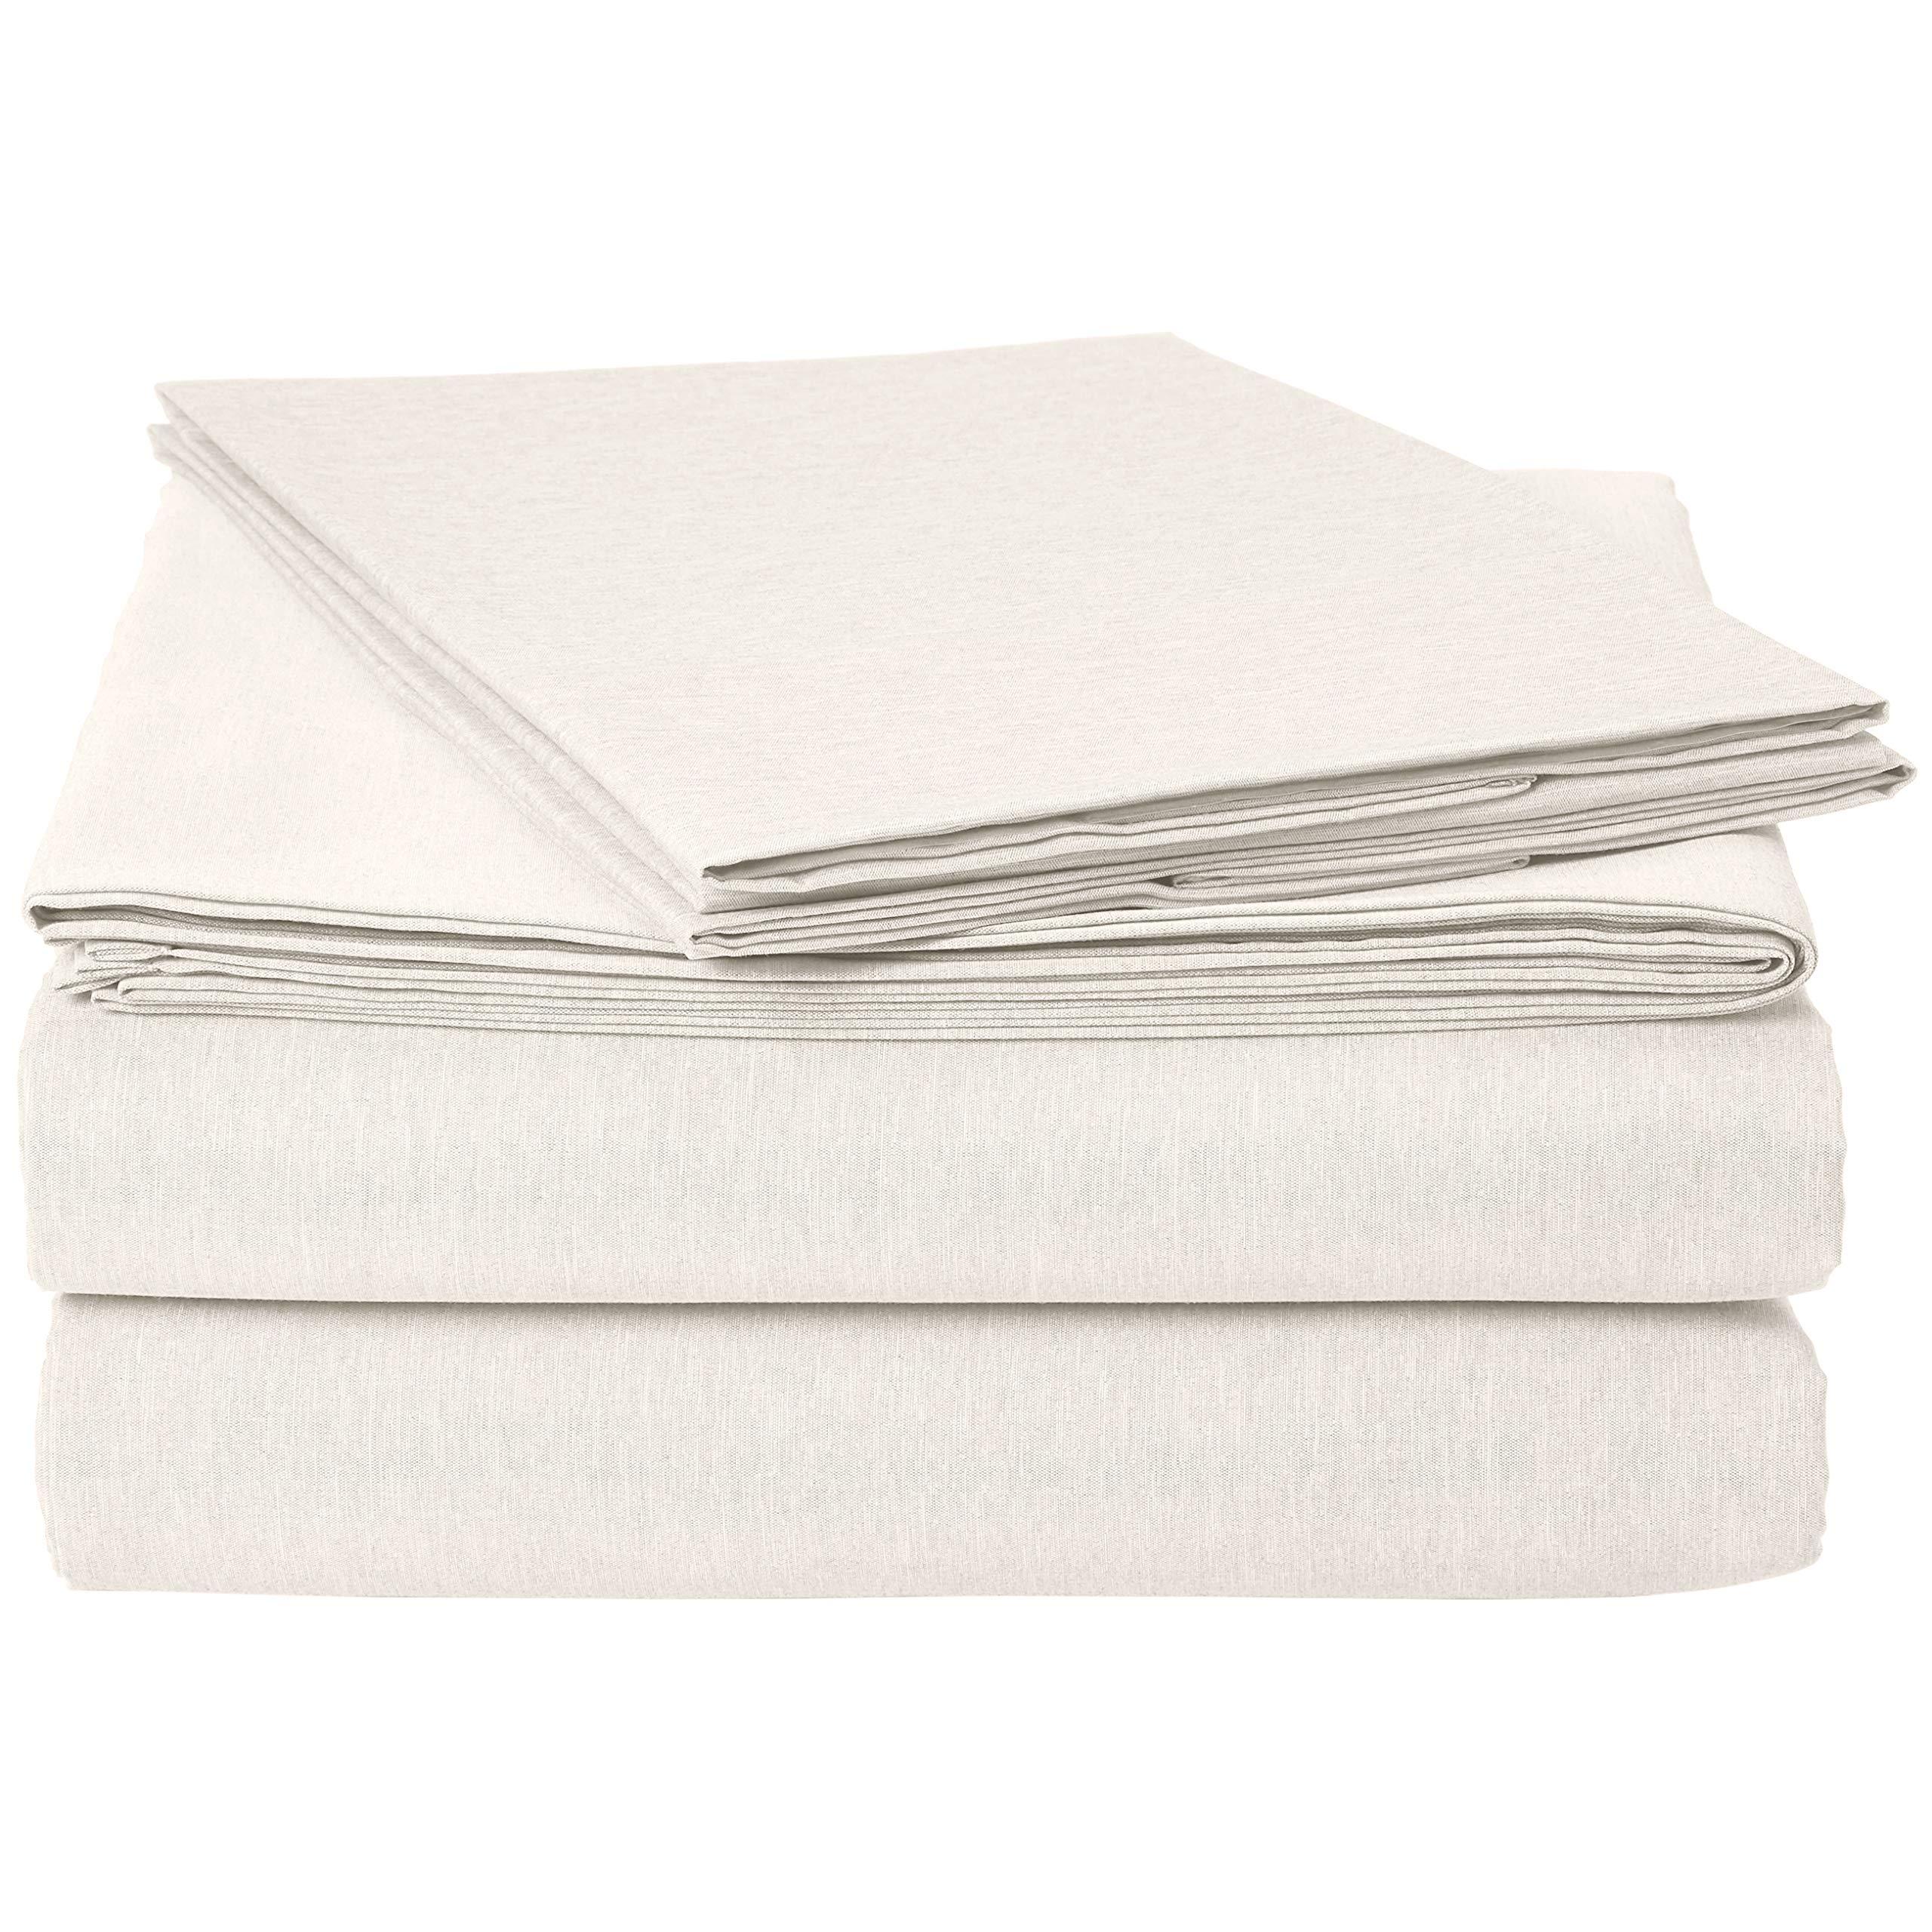 AmazonBasics Chambray Sheet Set - Queen, Soft Grey